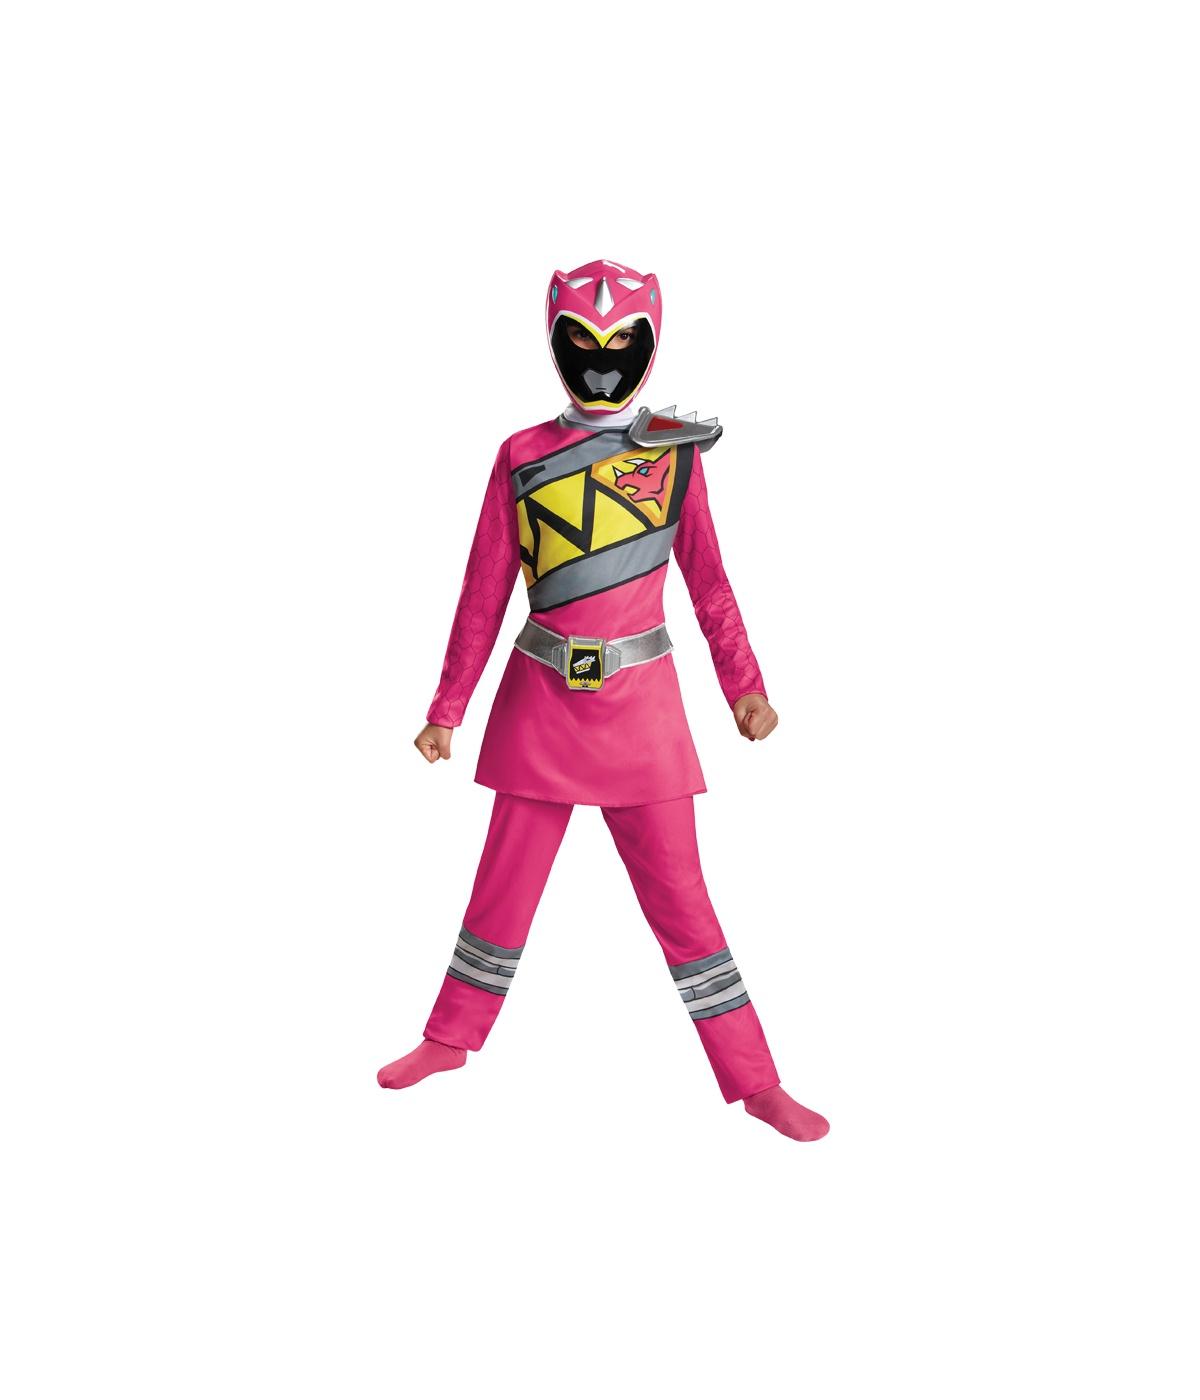 Power Rangers Dino Classic Pink Ranger Girls Costume  sc 1 st  Wonder Costumes & Girl Costumes - Girls Superhero Costumes